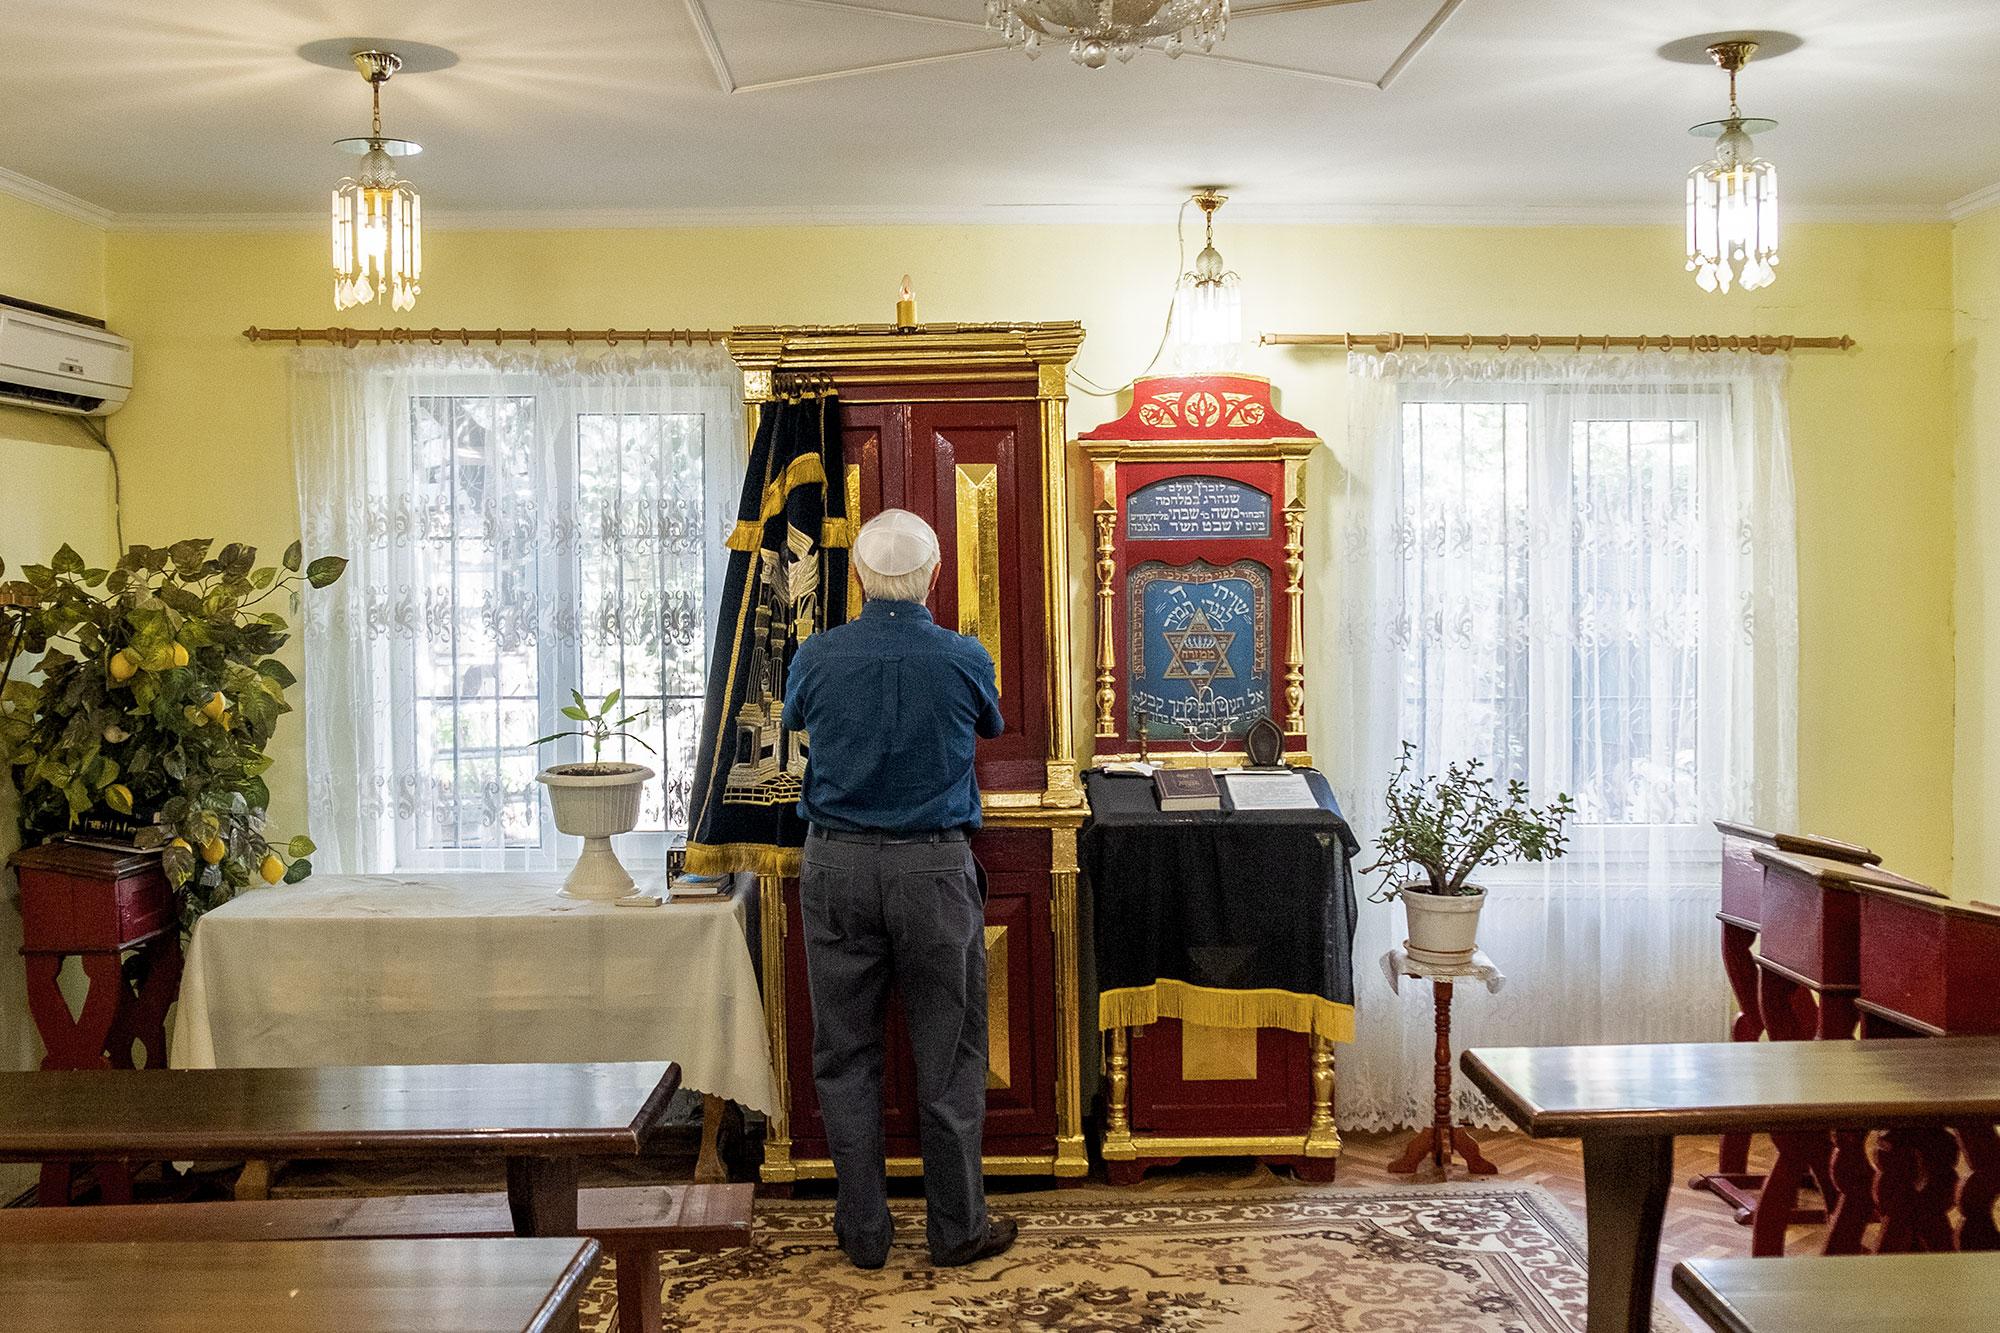 Mohyliv-Podilskyi - synagogue